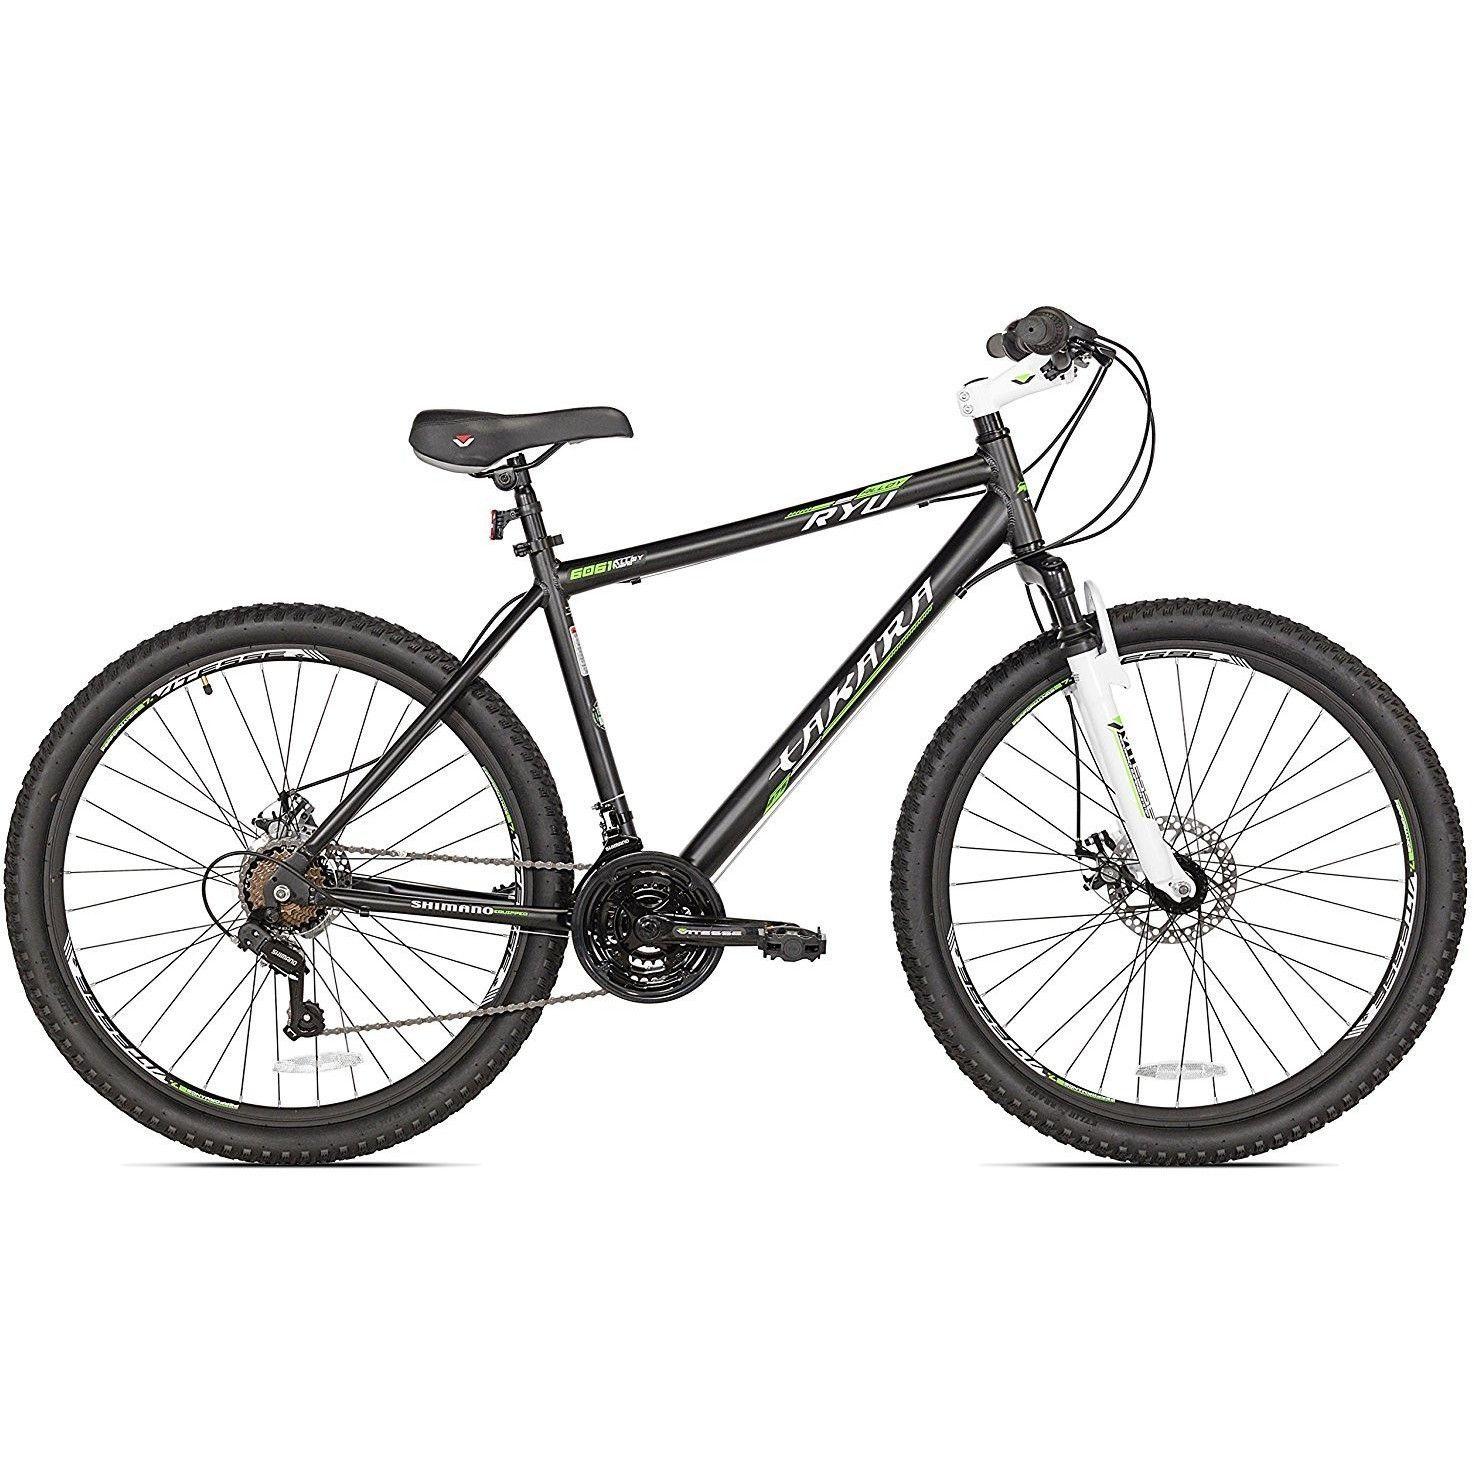 Takara Ryu Mountain Bike 27 5 Bicycle Maintenance Bike